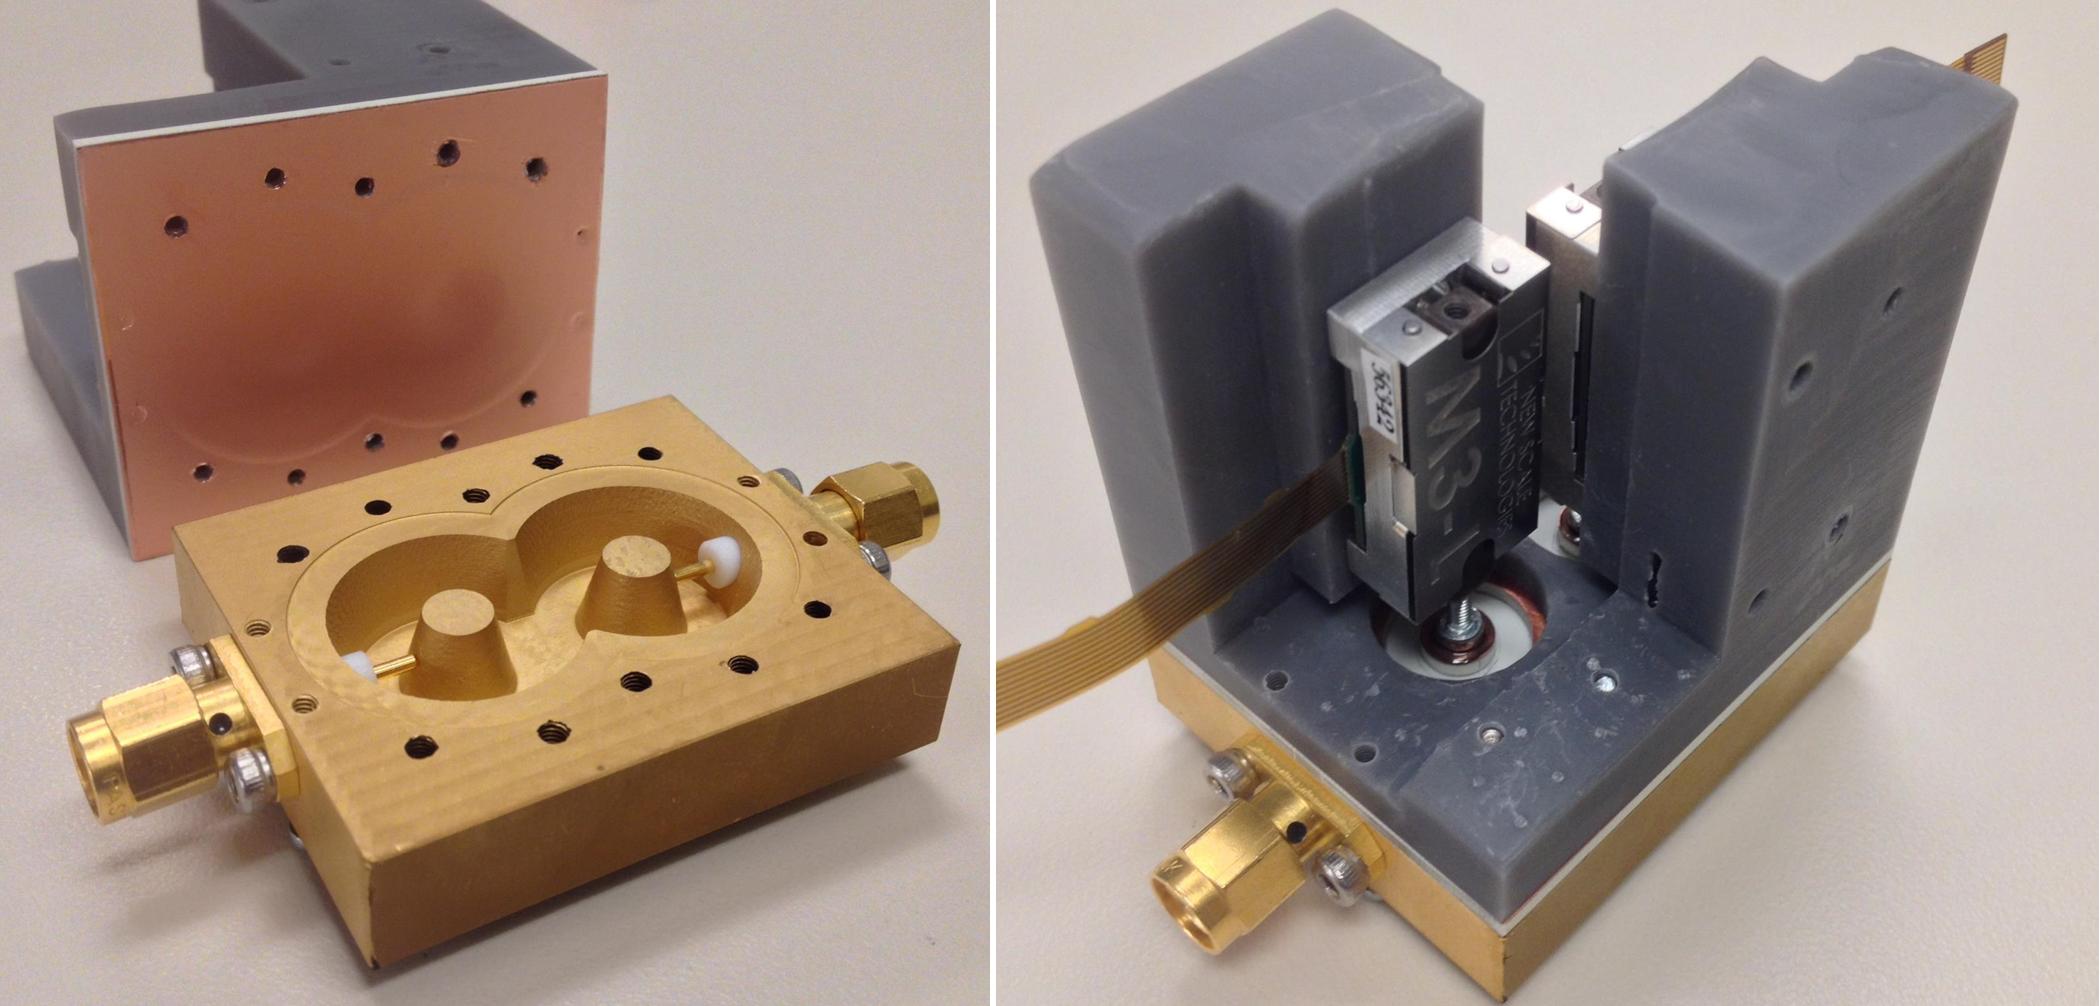 purdue-5g-bandpass-filter - New Scale Technologies